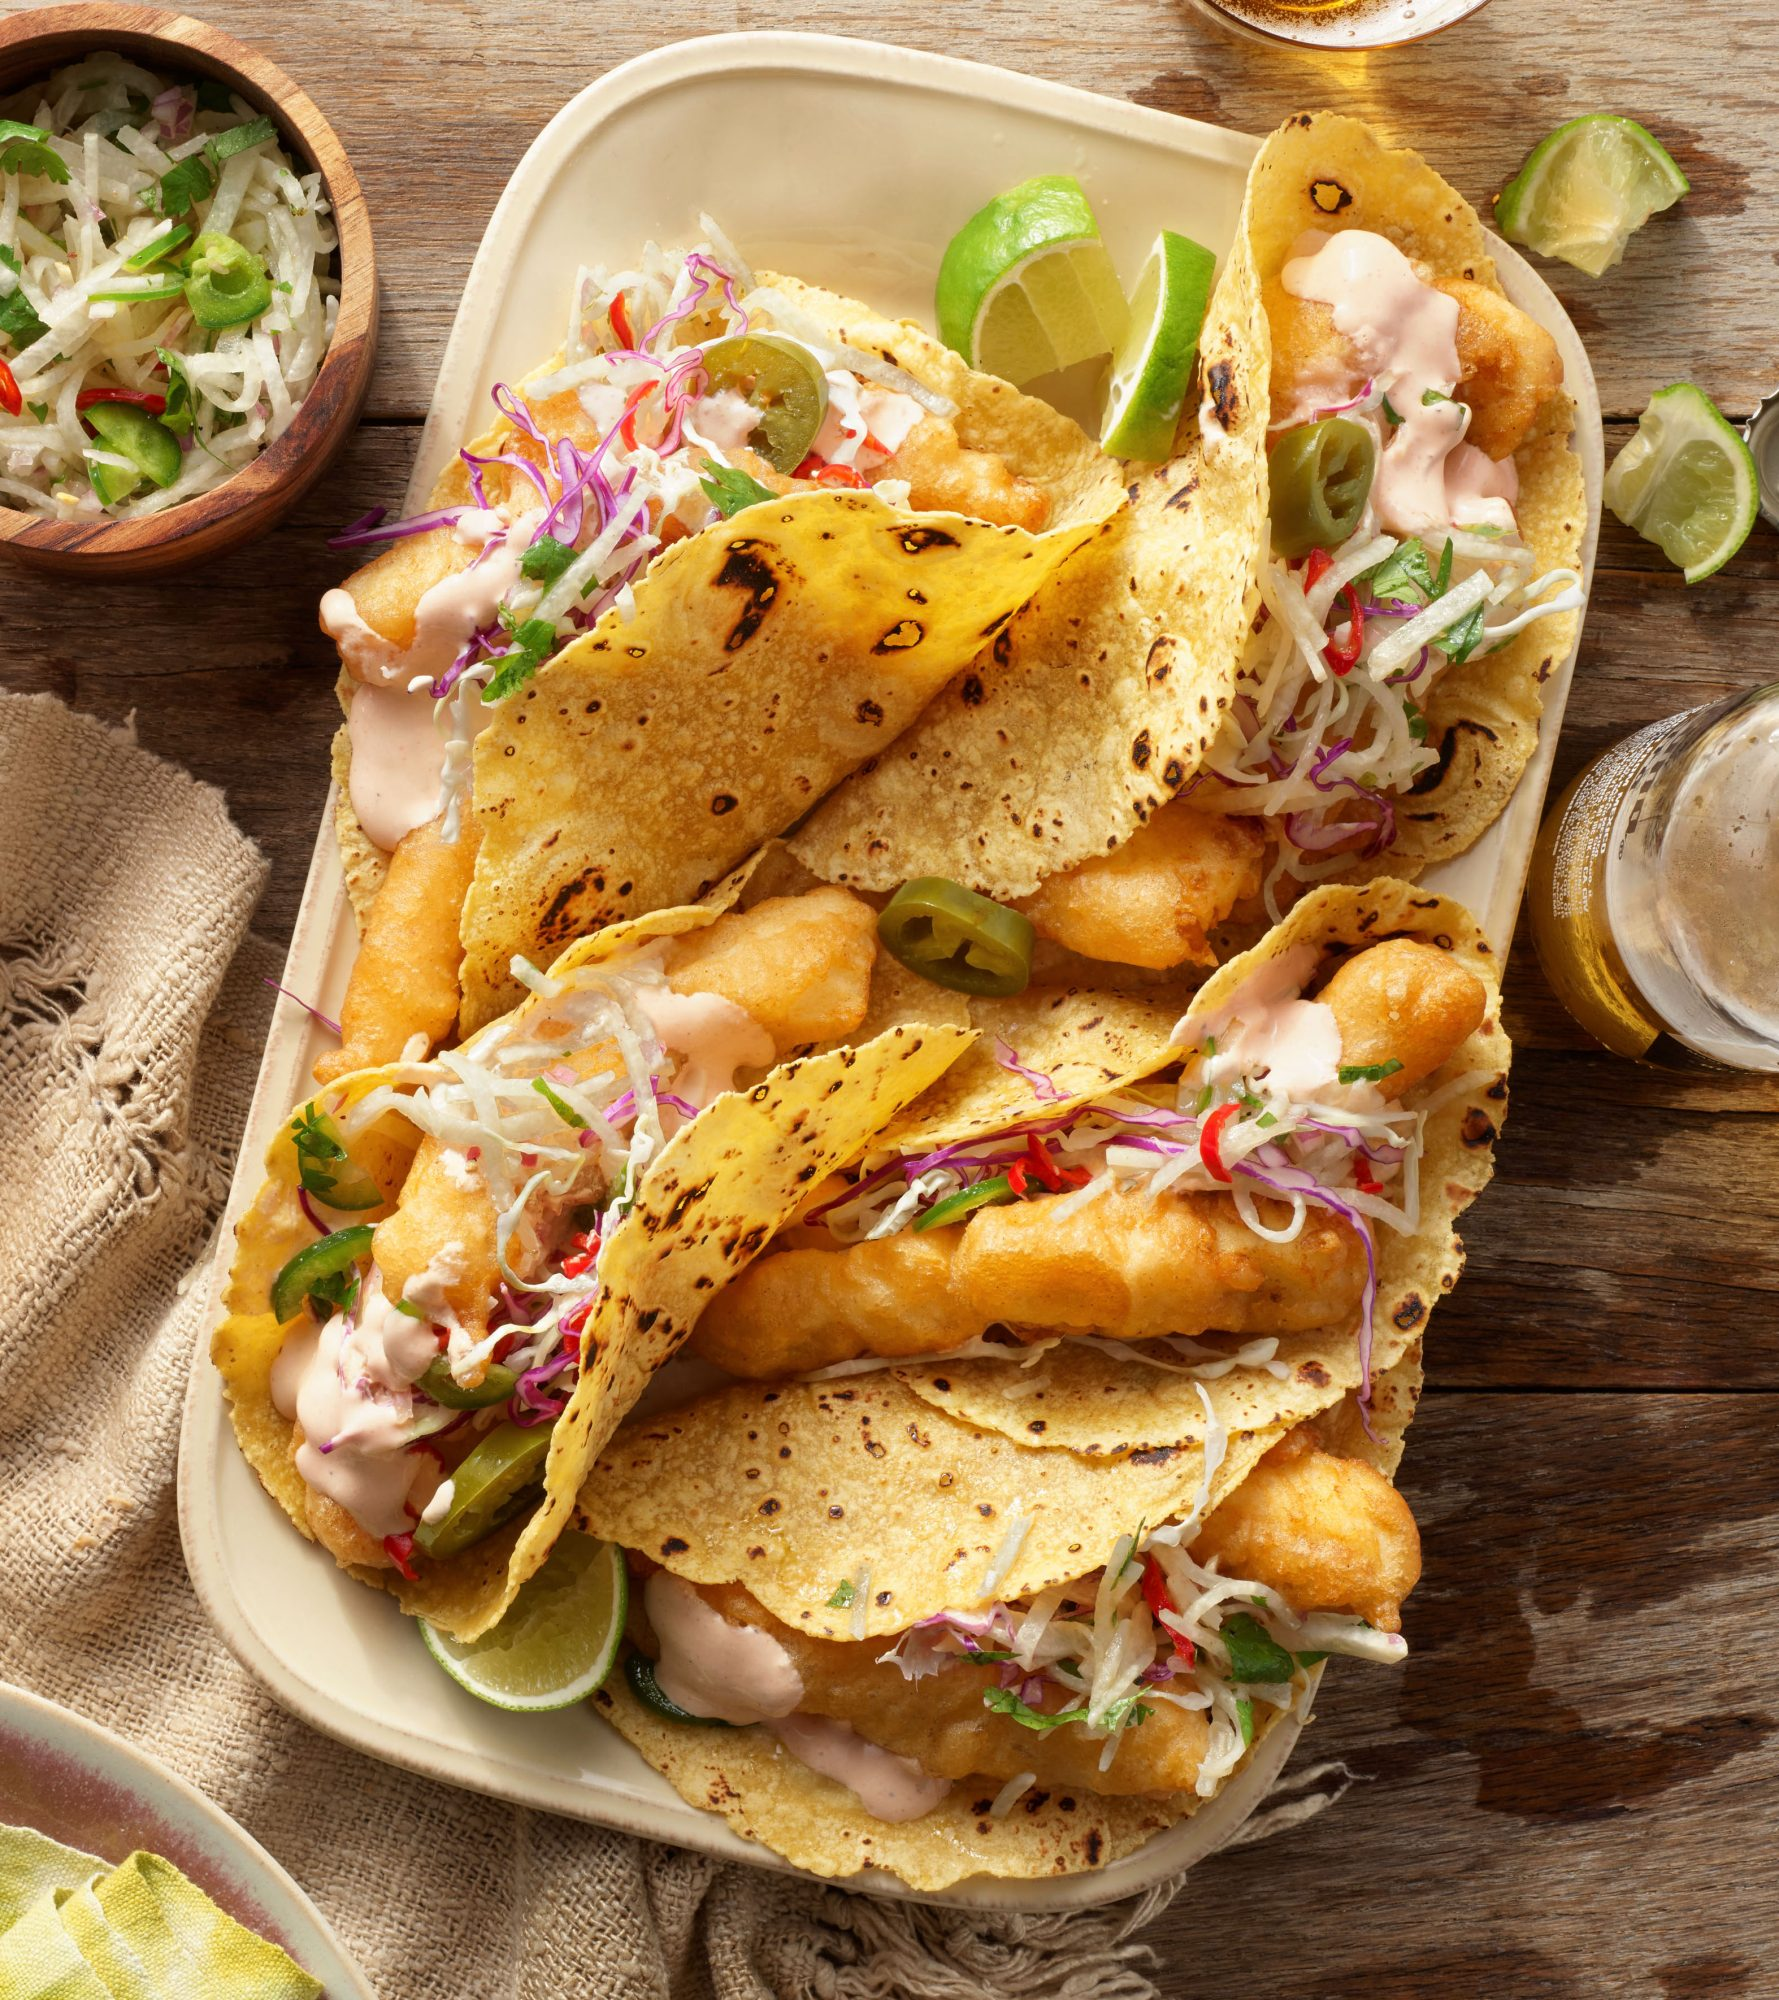 Rachael Ray's Baja Beer-Battered Fish Tacos